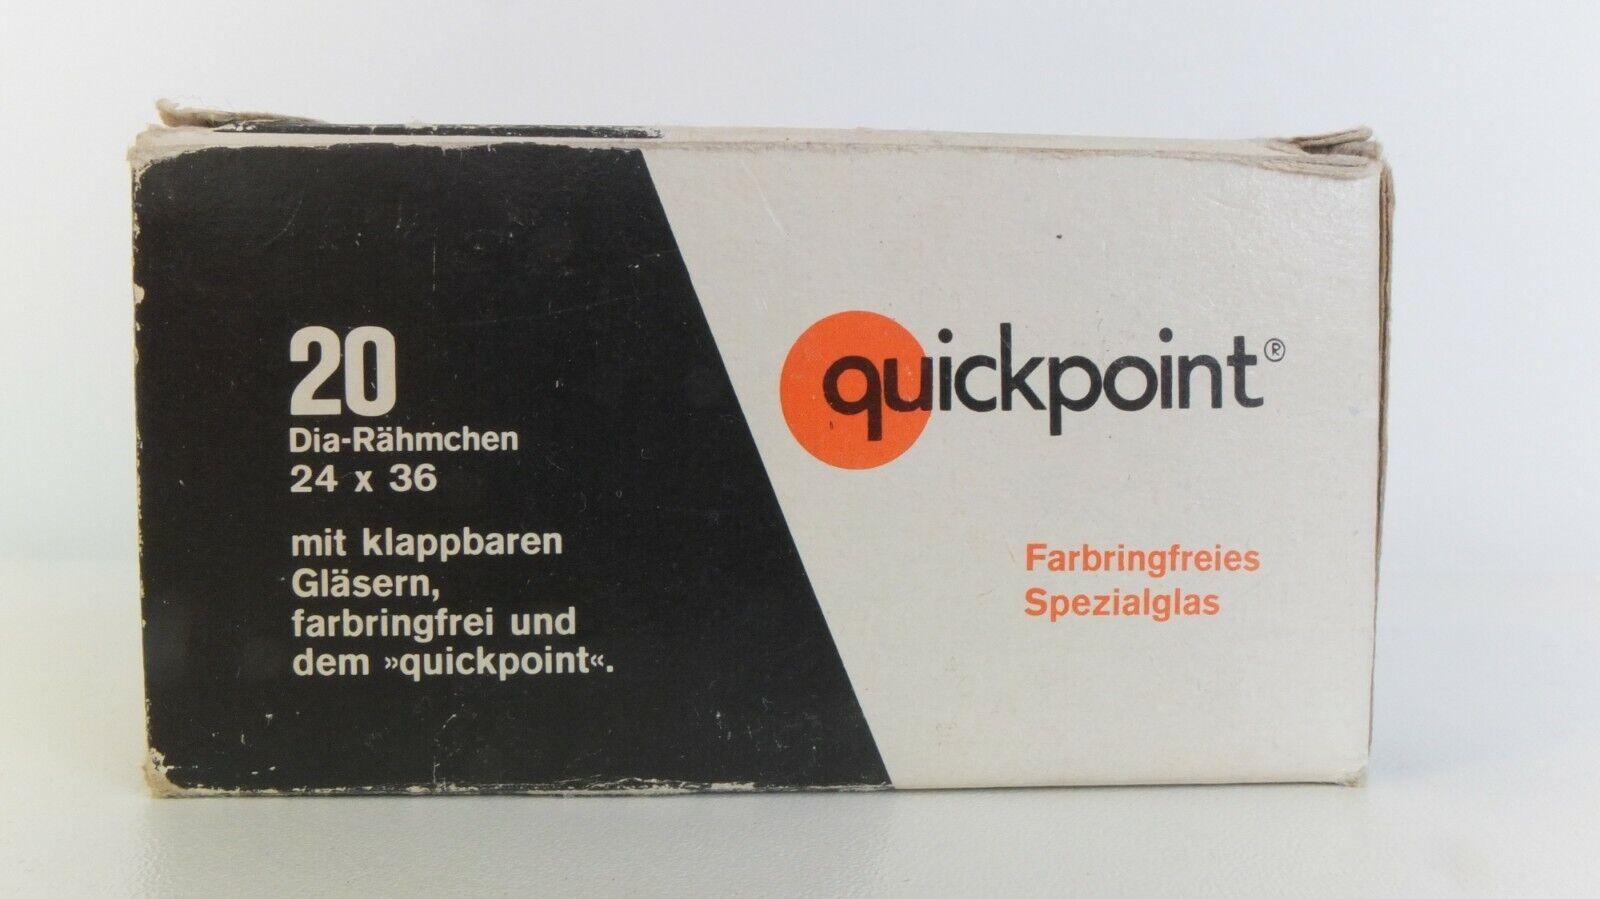 Quickpoint 20 slide mounts 24 x 36 New/unused in original box.